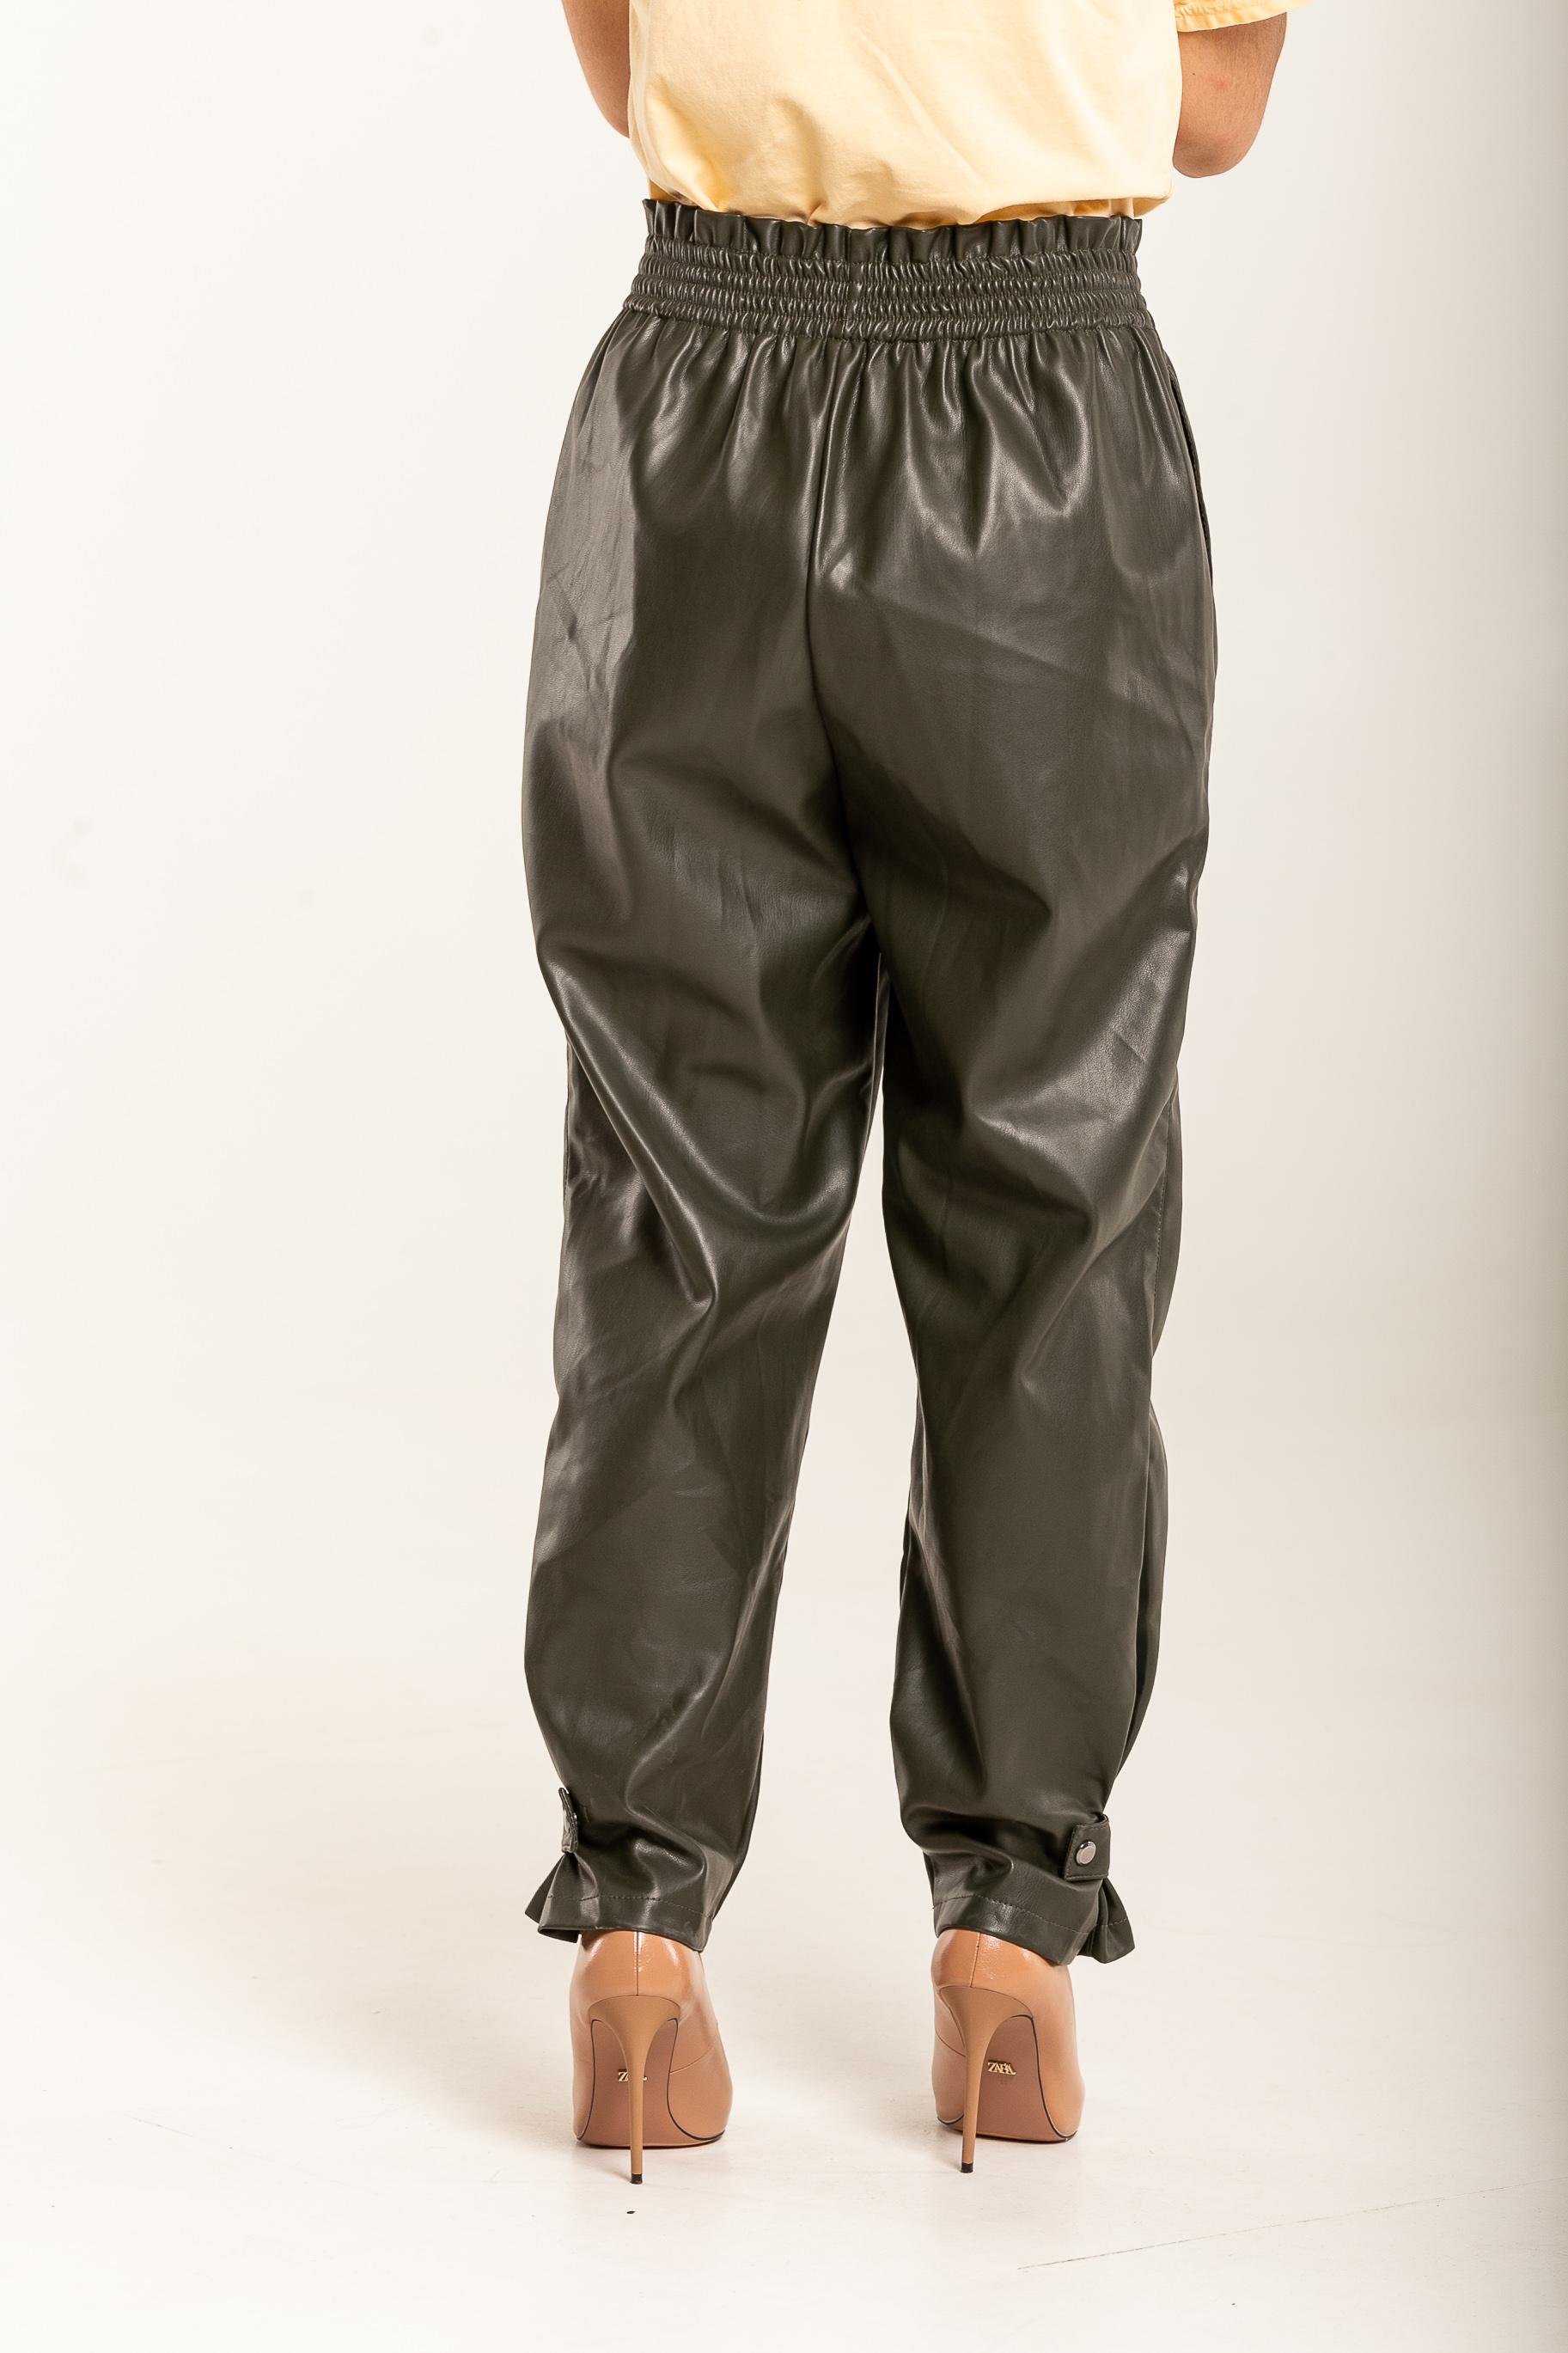 Pantaloni ONLY Casual (3334) photo 0